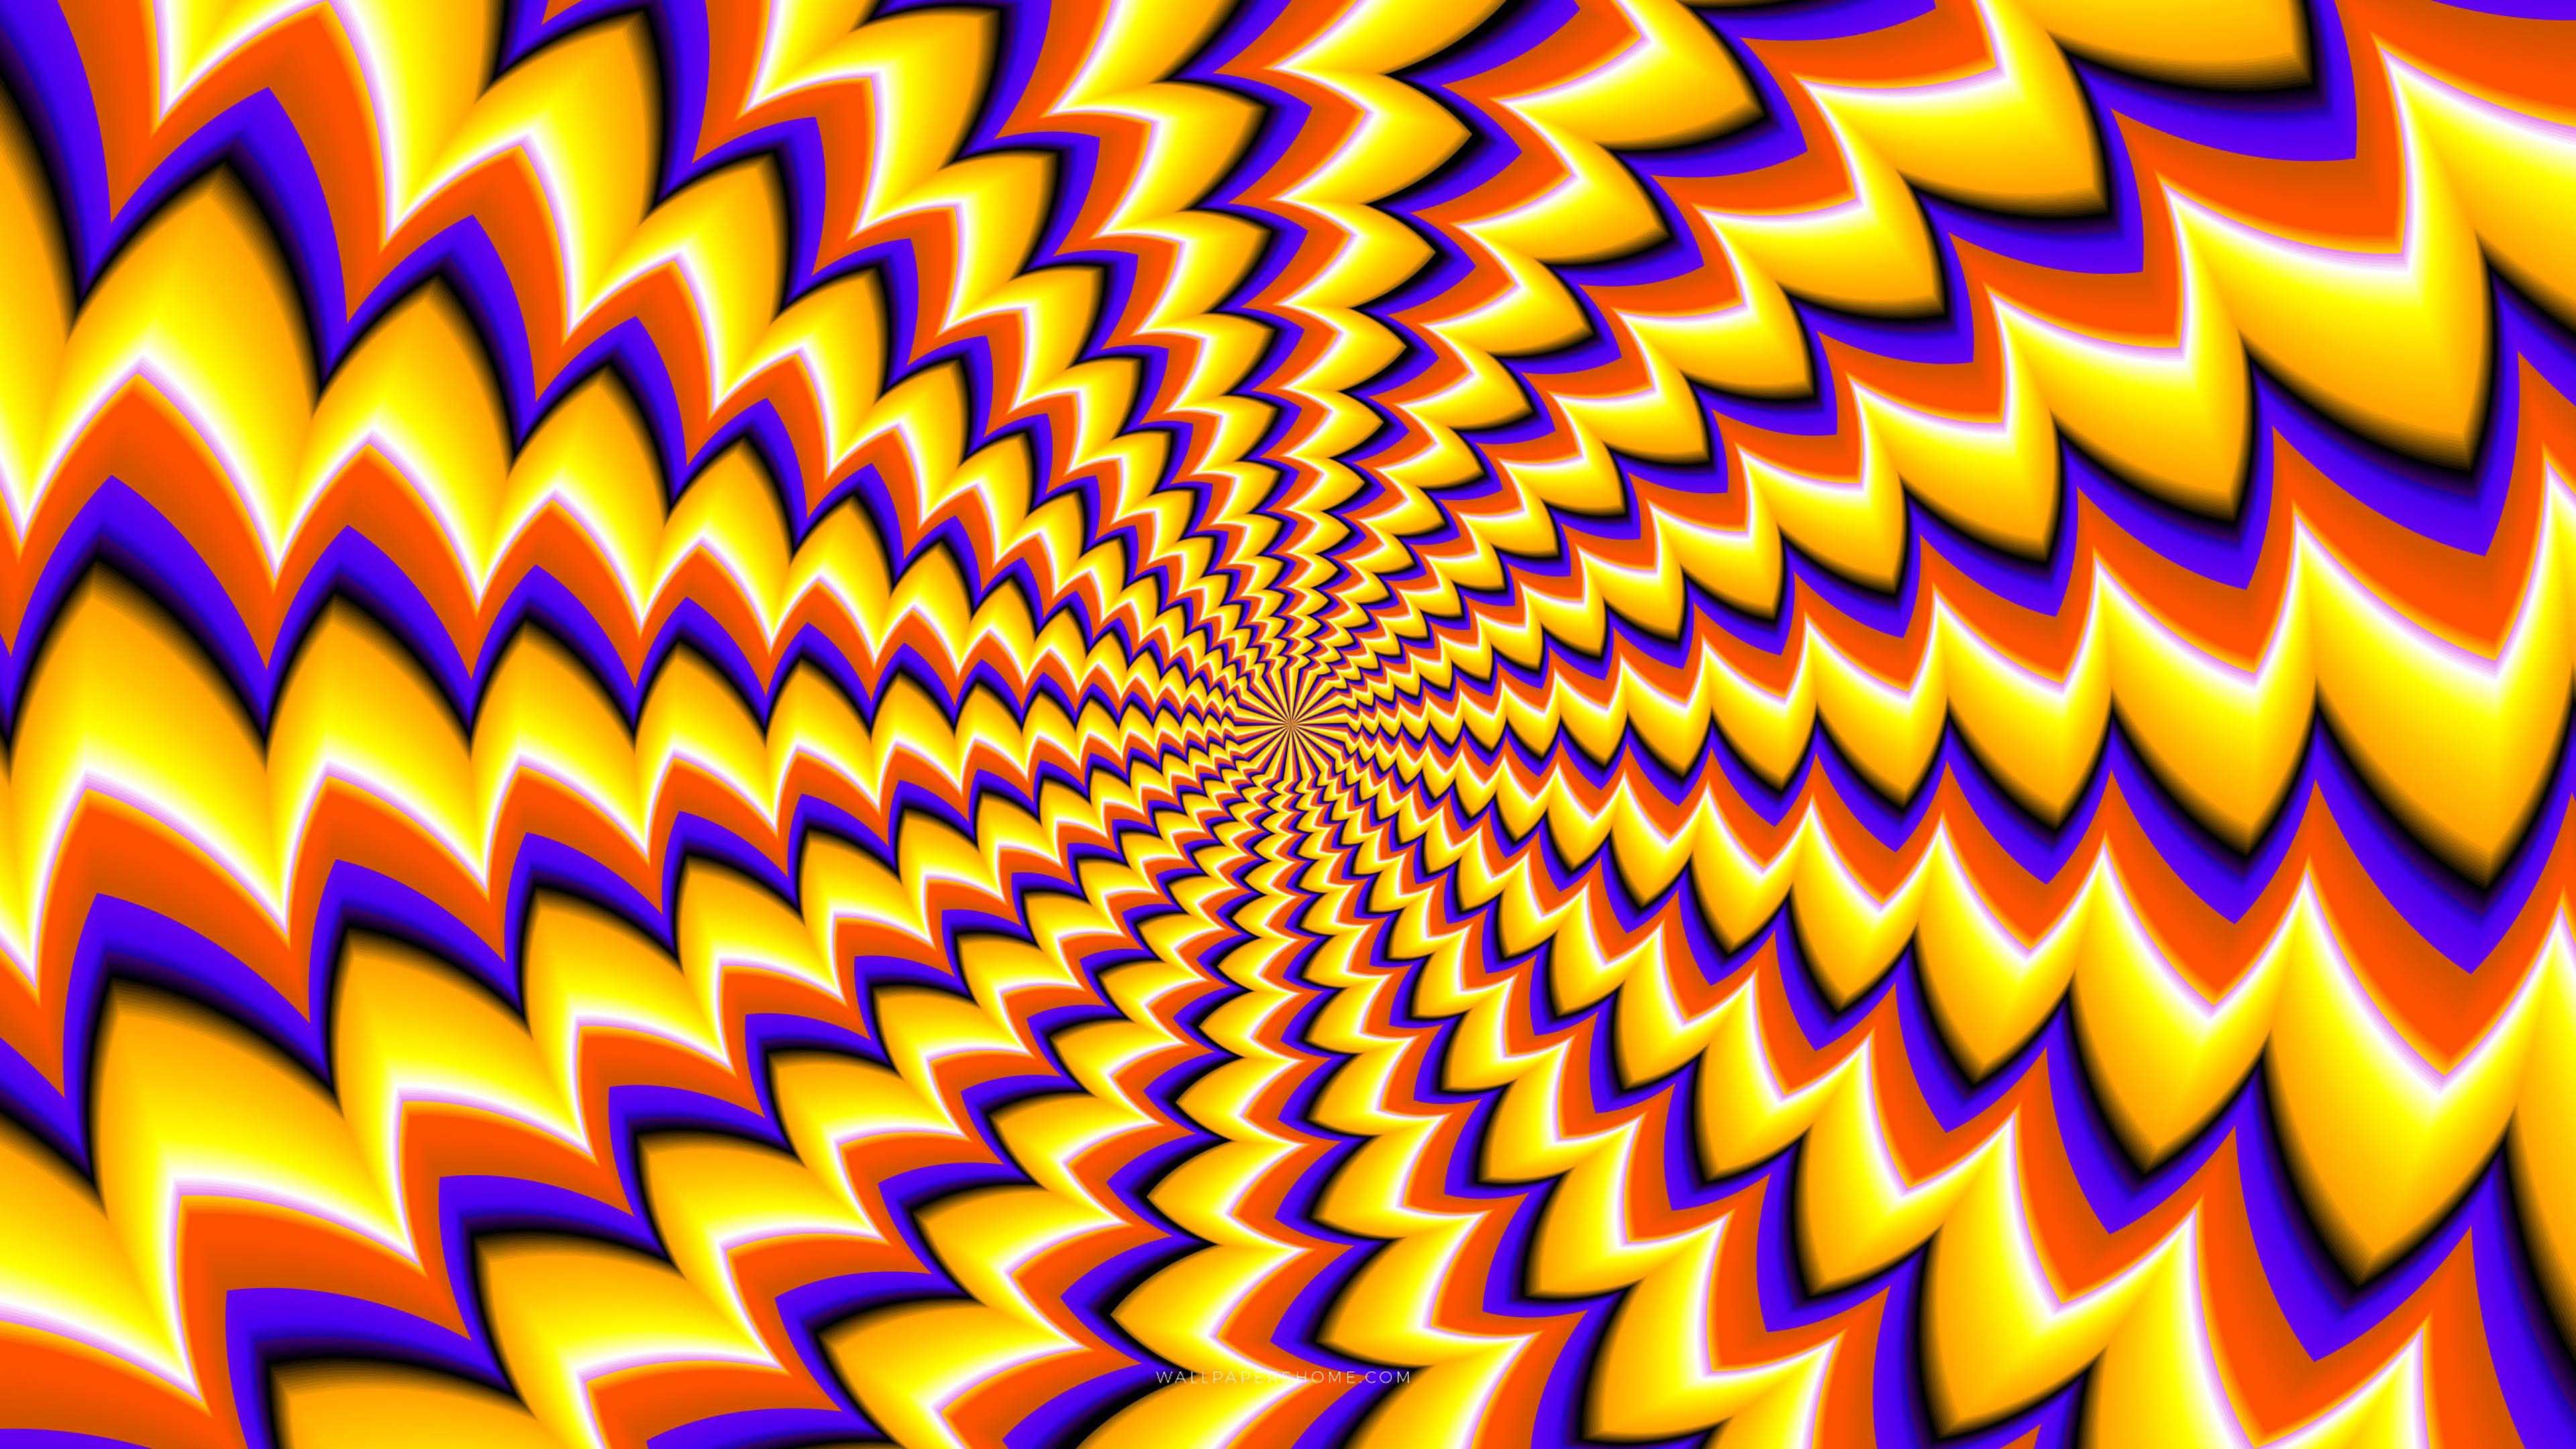 Optical Illusion 13236 Optical Illusions 4k Abstract Wallpaper Abstract Wallpapers 3d effect optical illusion wallpaper